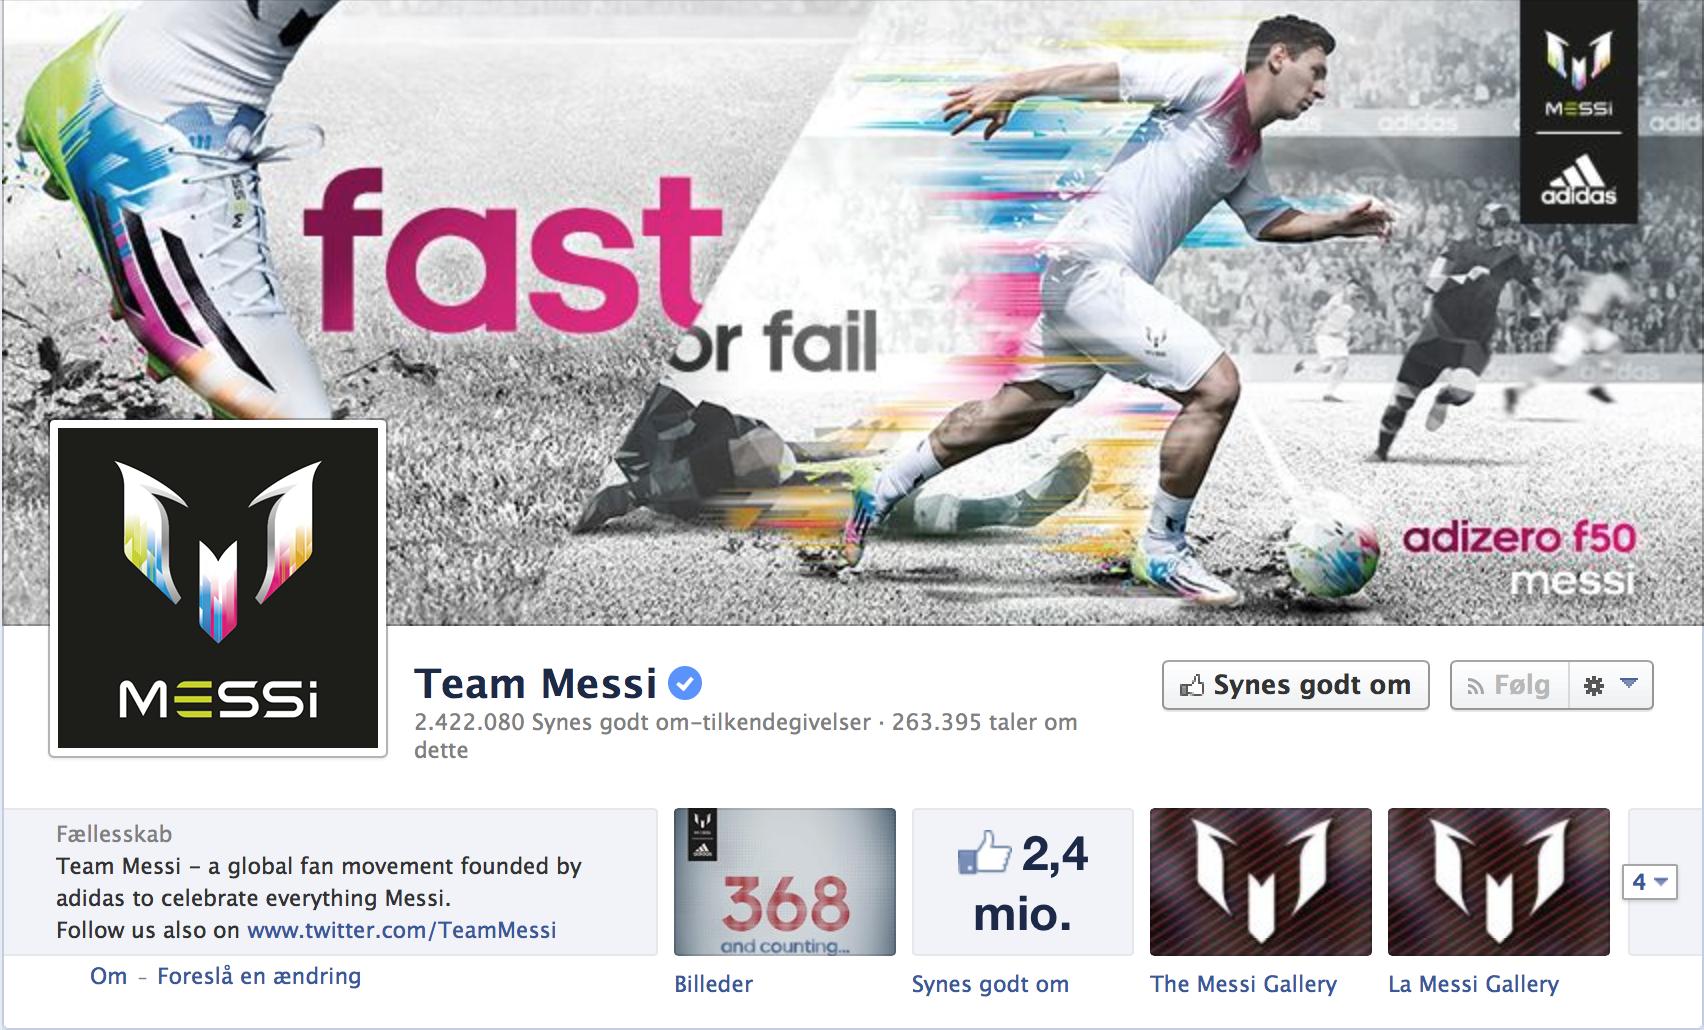 Messi Football Adidas Fifa World Cup 2014 And Hybrid Sportsbranding